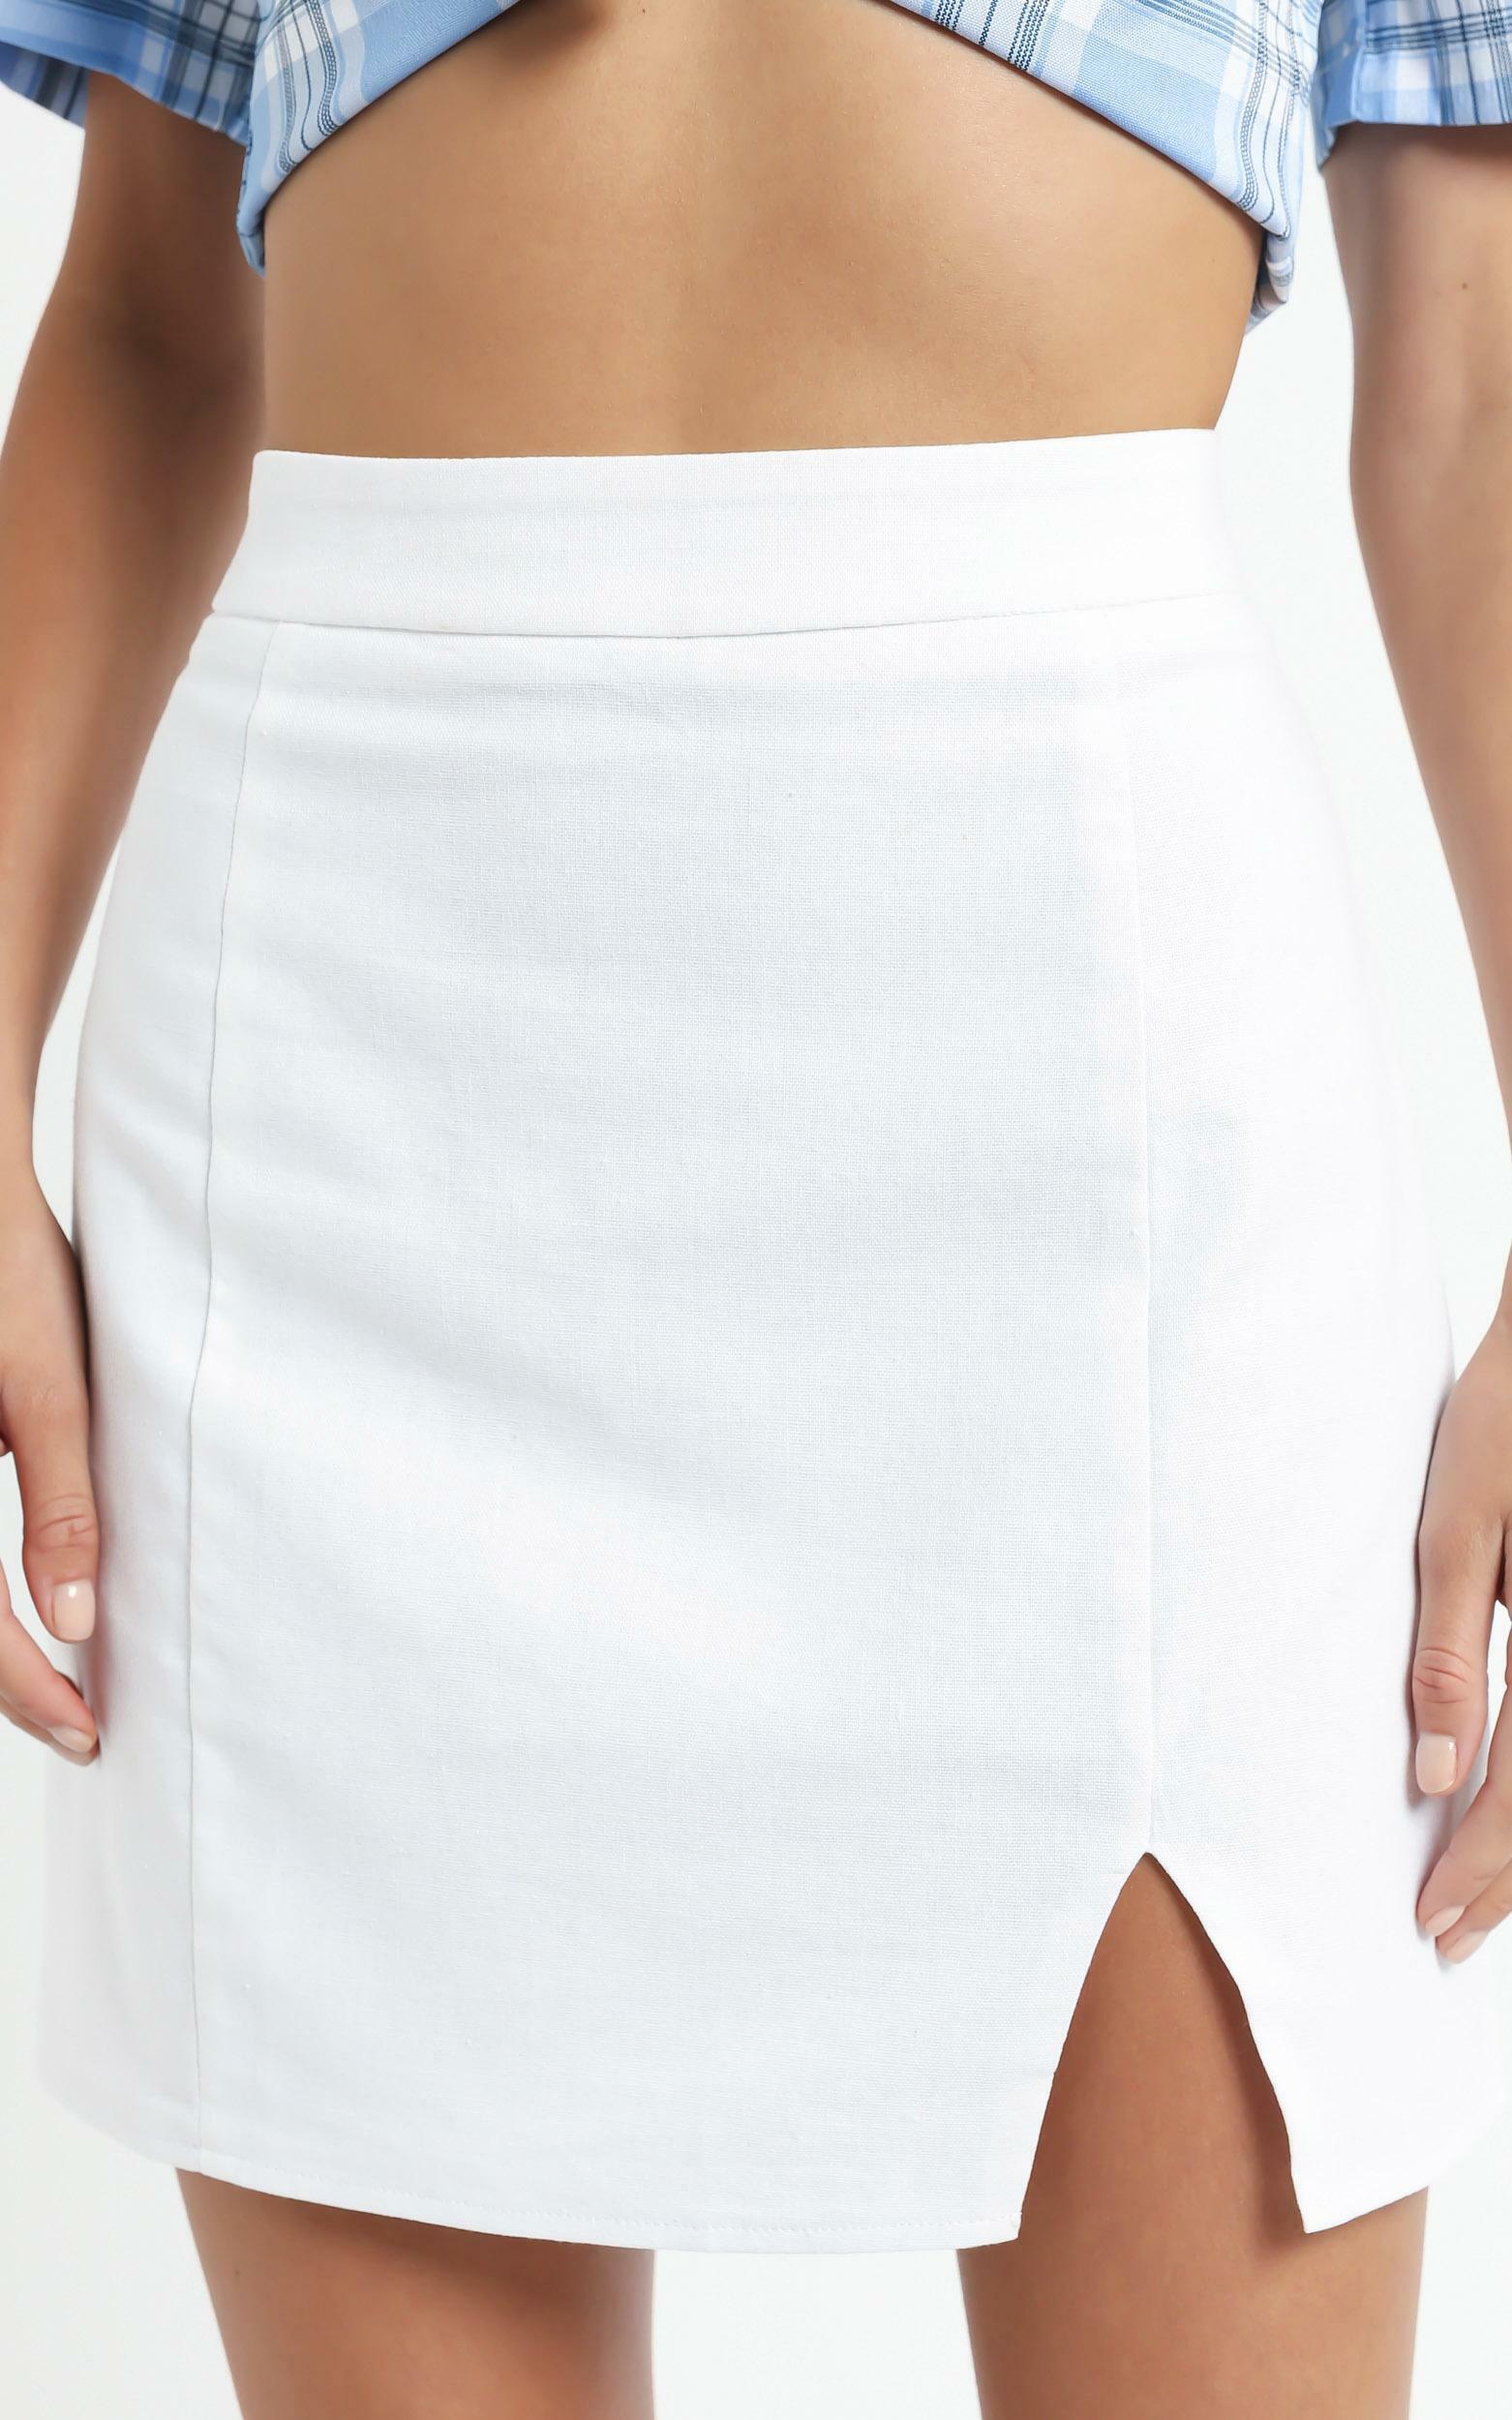 International Babe Skirt In White Linen Look - 20 (XXXXL), White, hi-res image number null